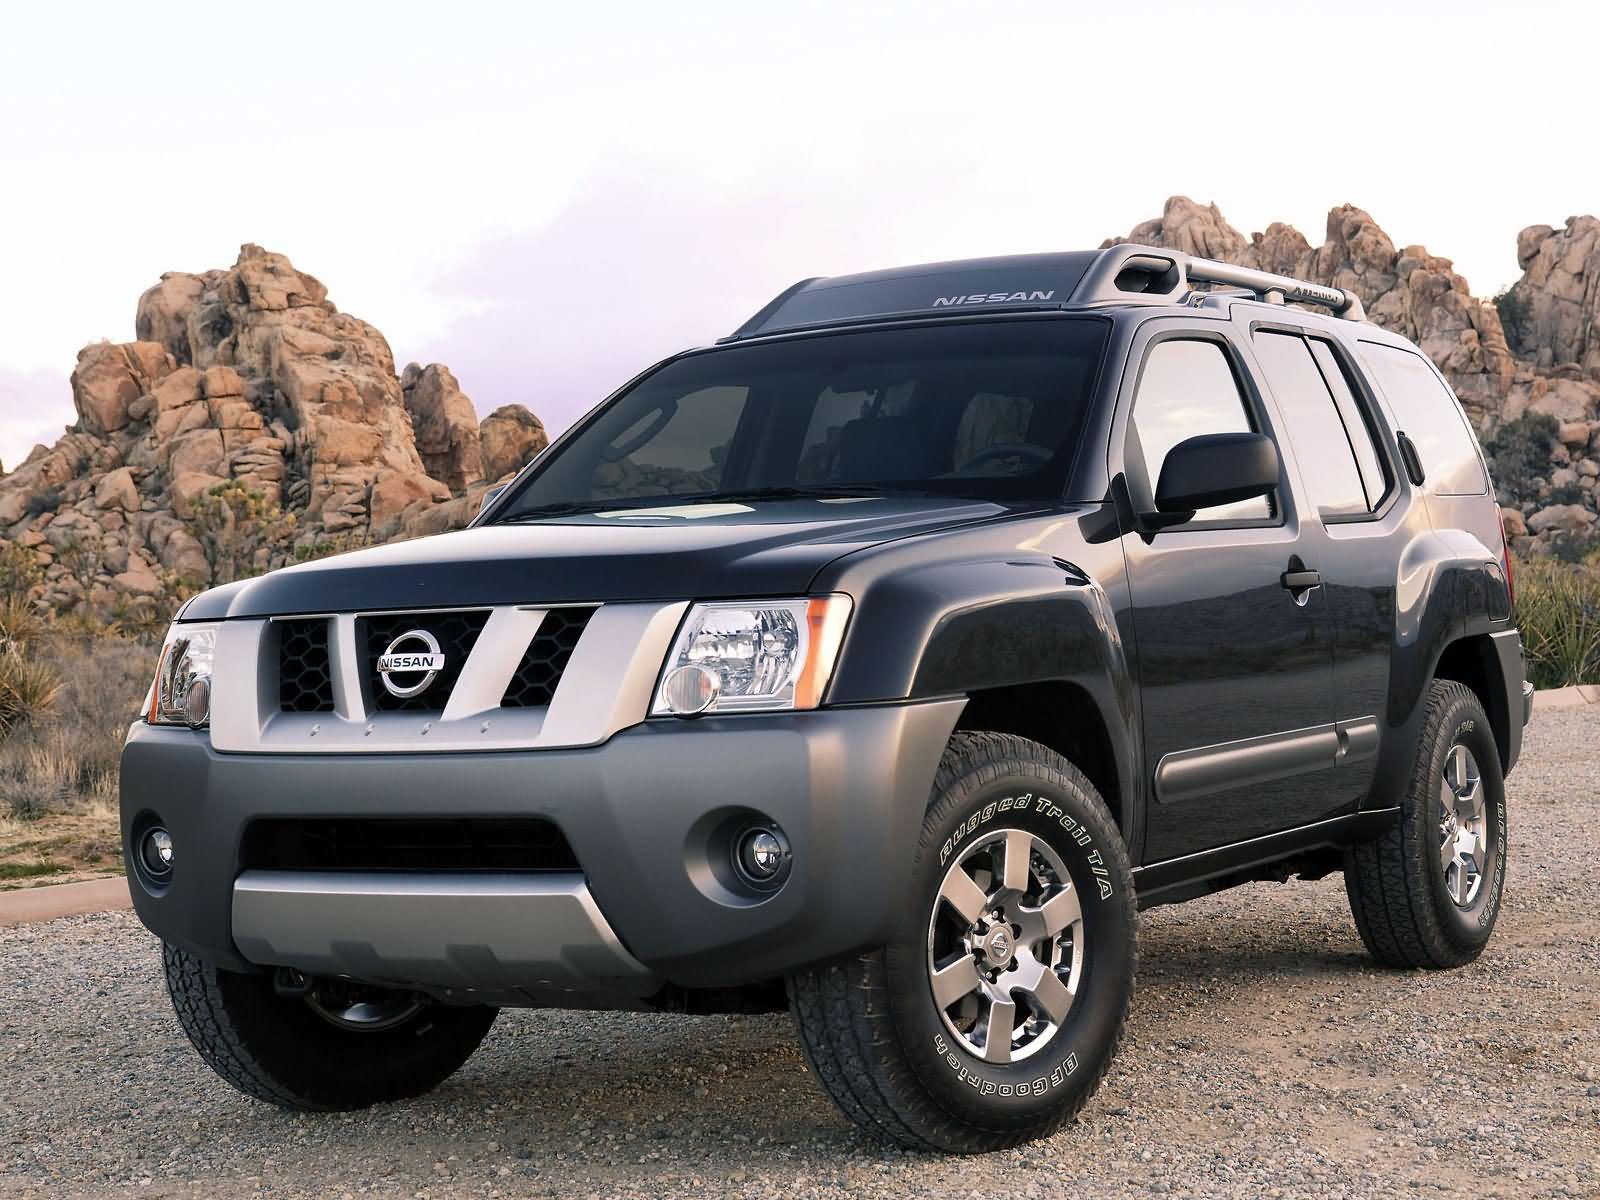 Nissan Xterra Black Wheels >> Nissan Xterra picture # 6584 | Nissan photo gallery | CarsBase.com